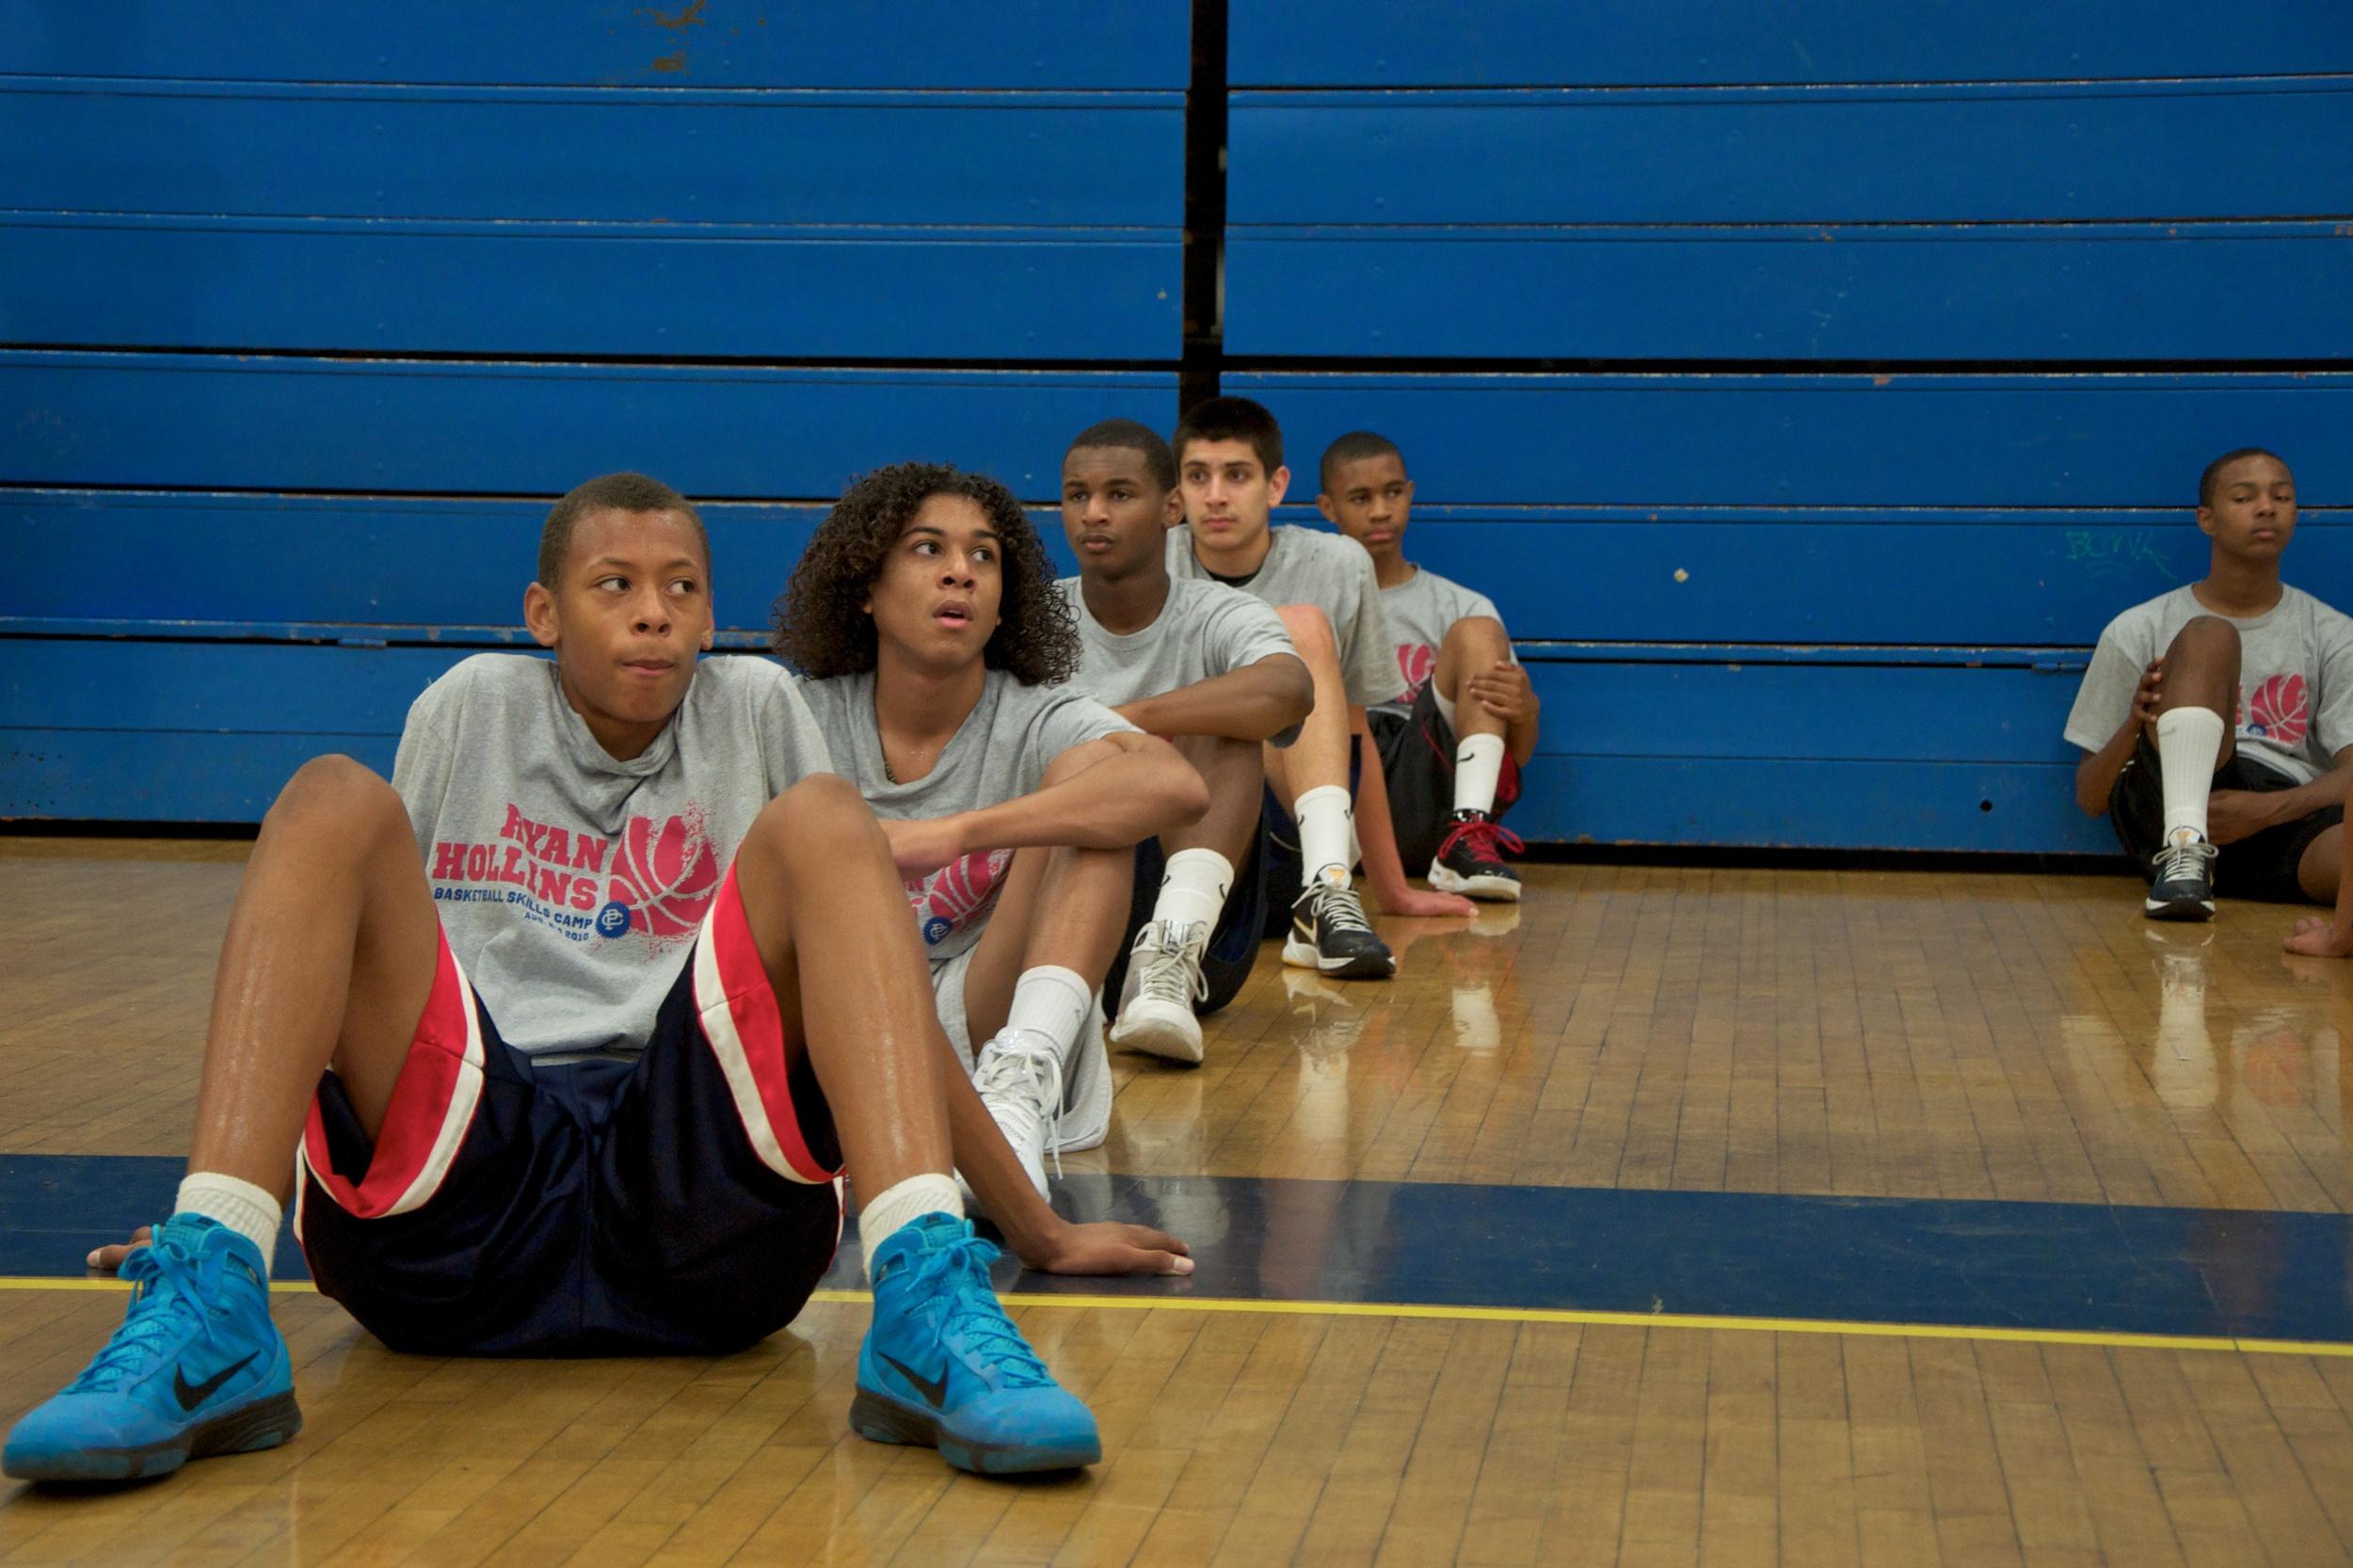 Ryan Hollins Basketball Camp 13.jpg